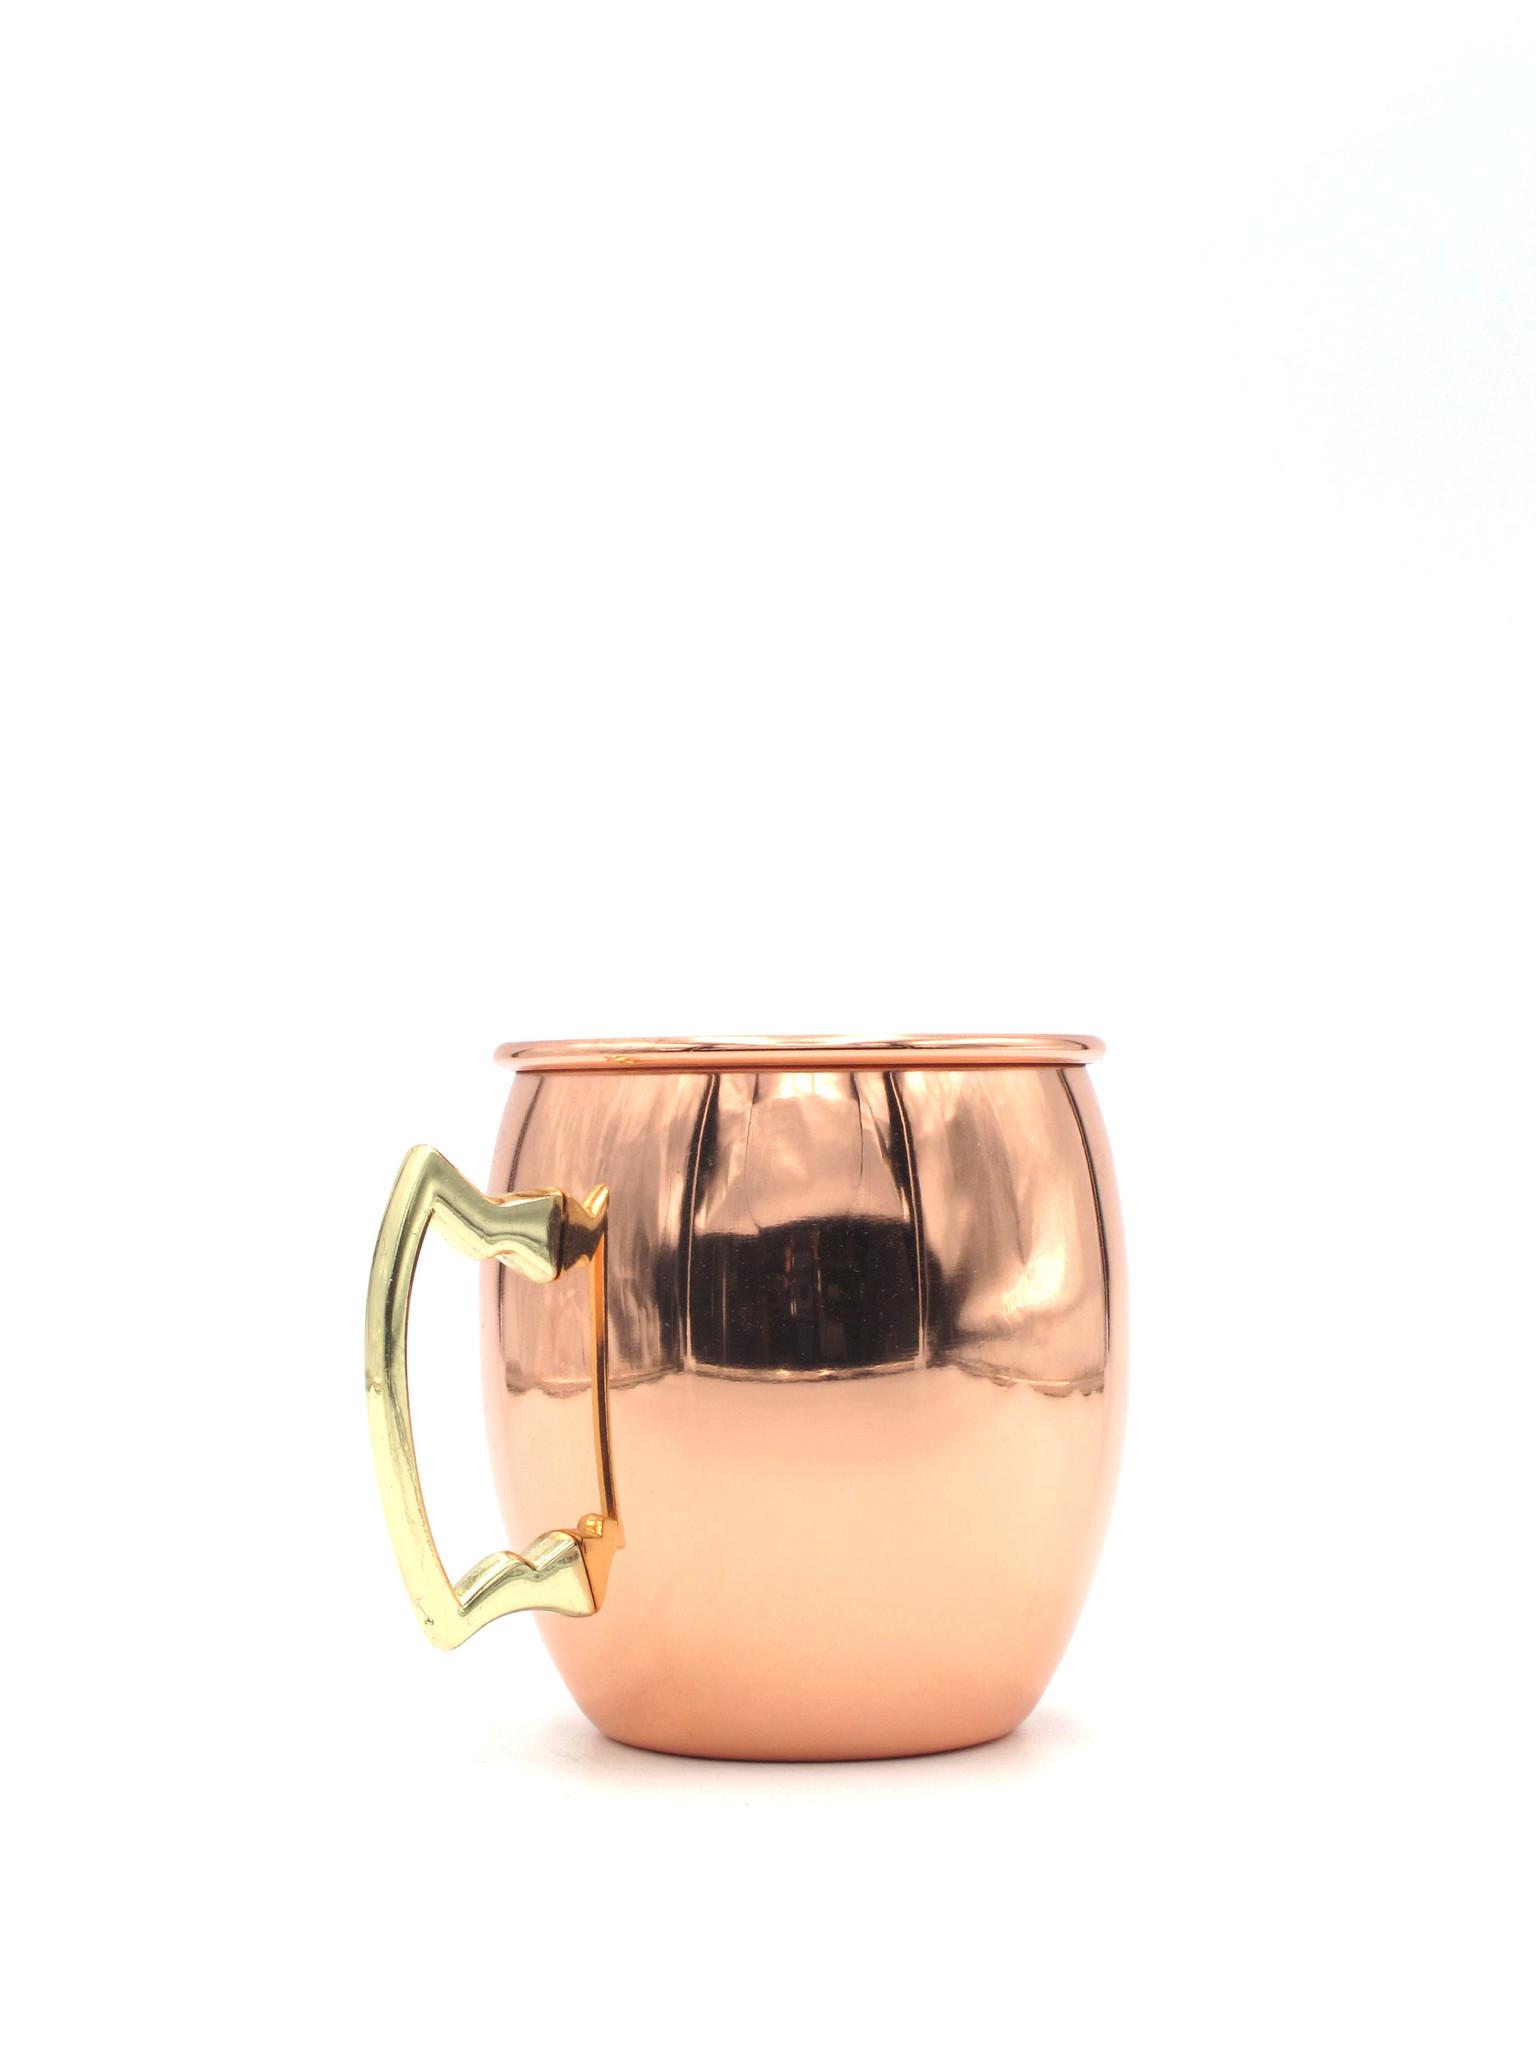 True Brands True Brands Moscow Mule Copper Plated Mug 16oz